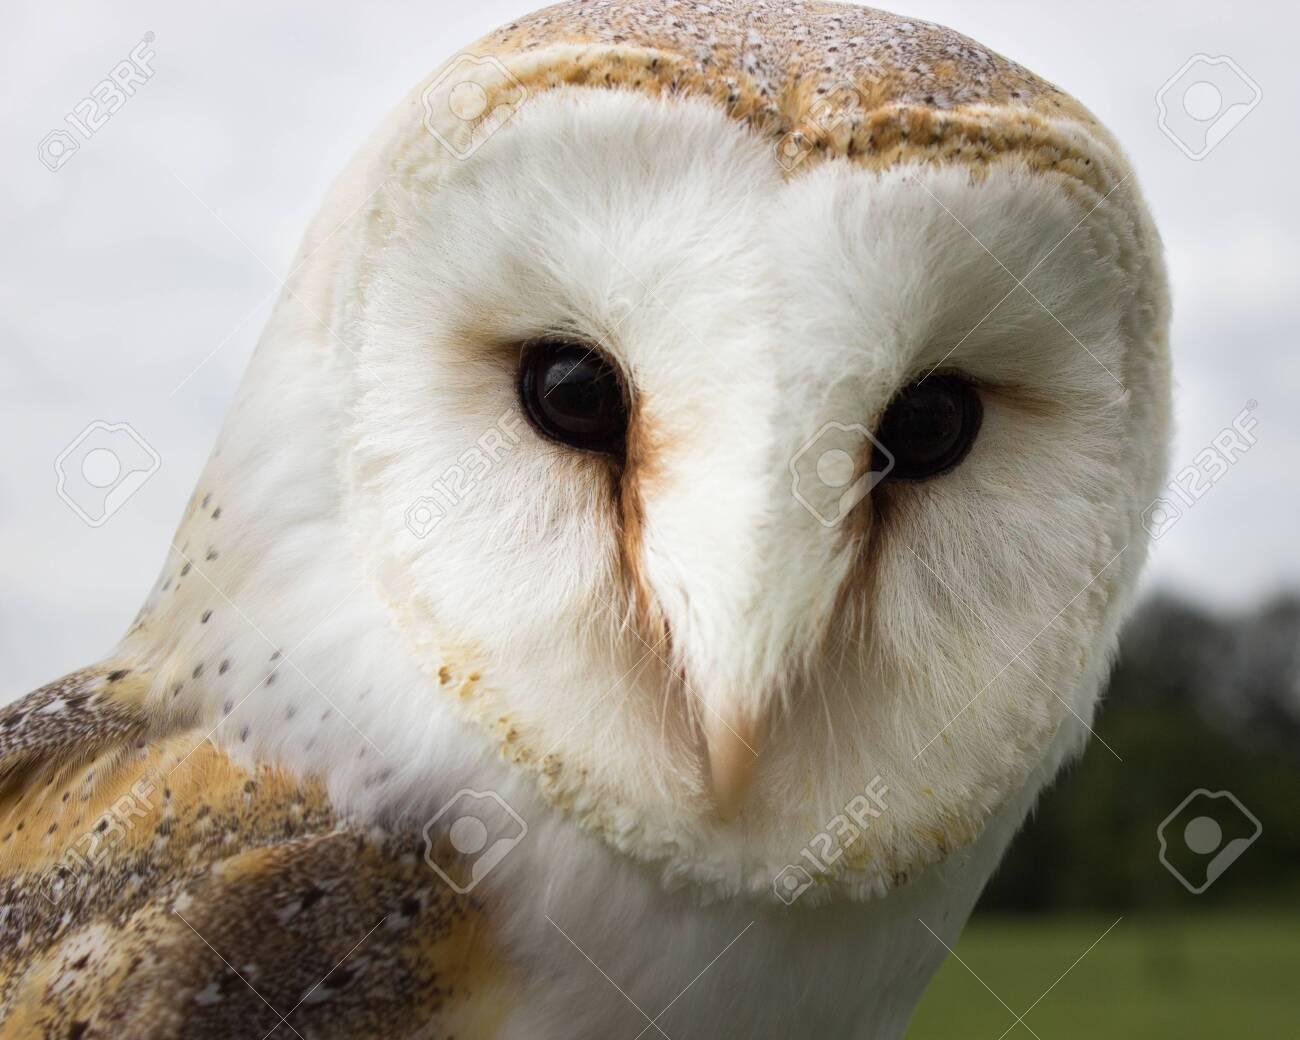 Barn Owl Face Close Up - 135324436